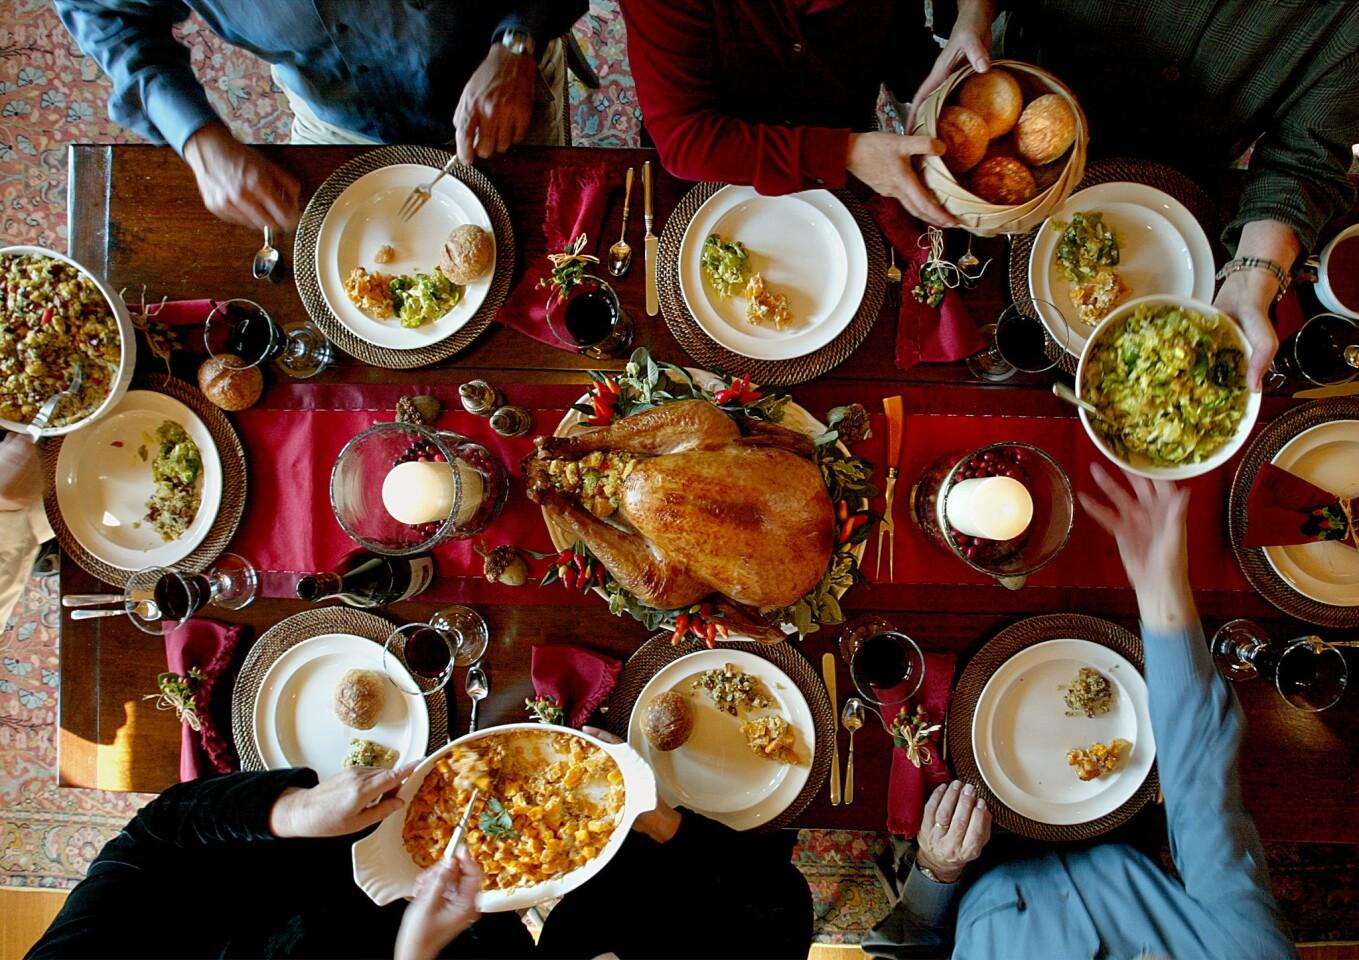 Soy-brined turkey, center; sausage-cornbread stuffing, left; and pumpkin-Gruyère gratin, bottom.